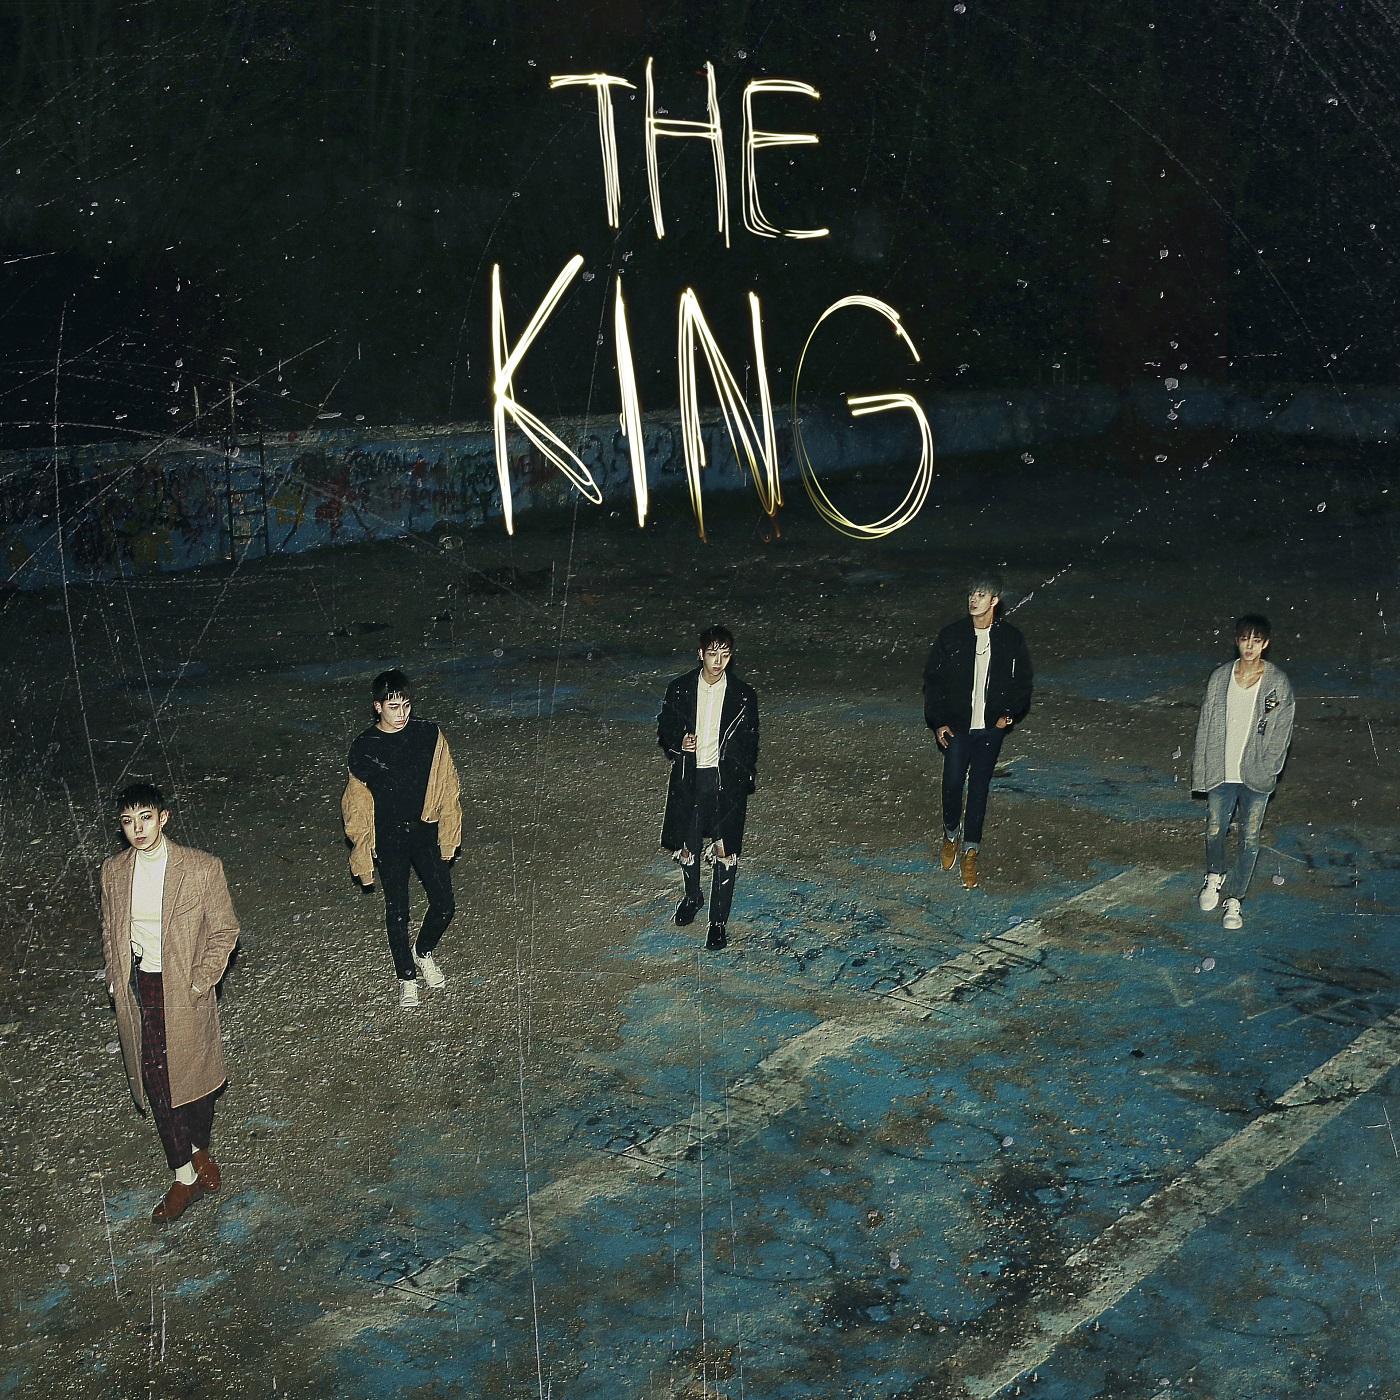 THE KING (Grupo)